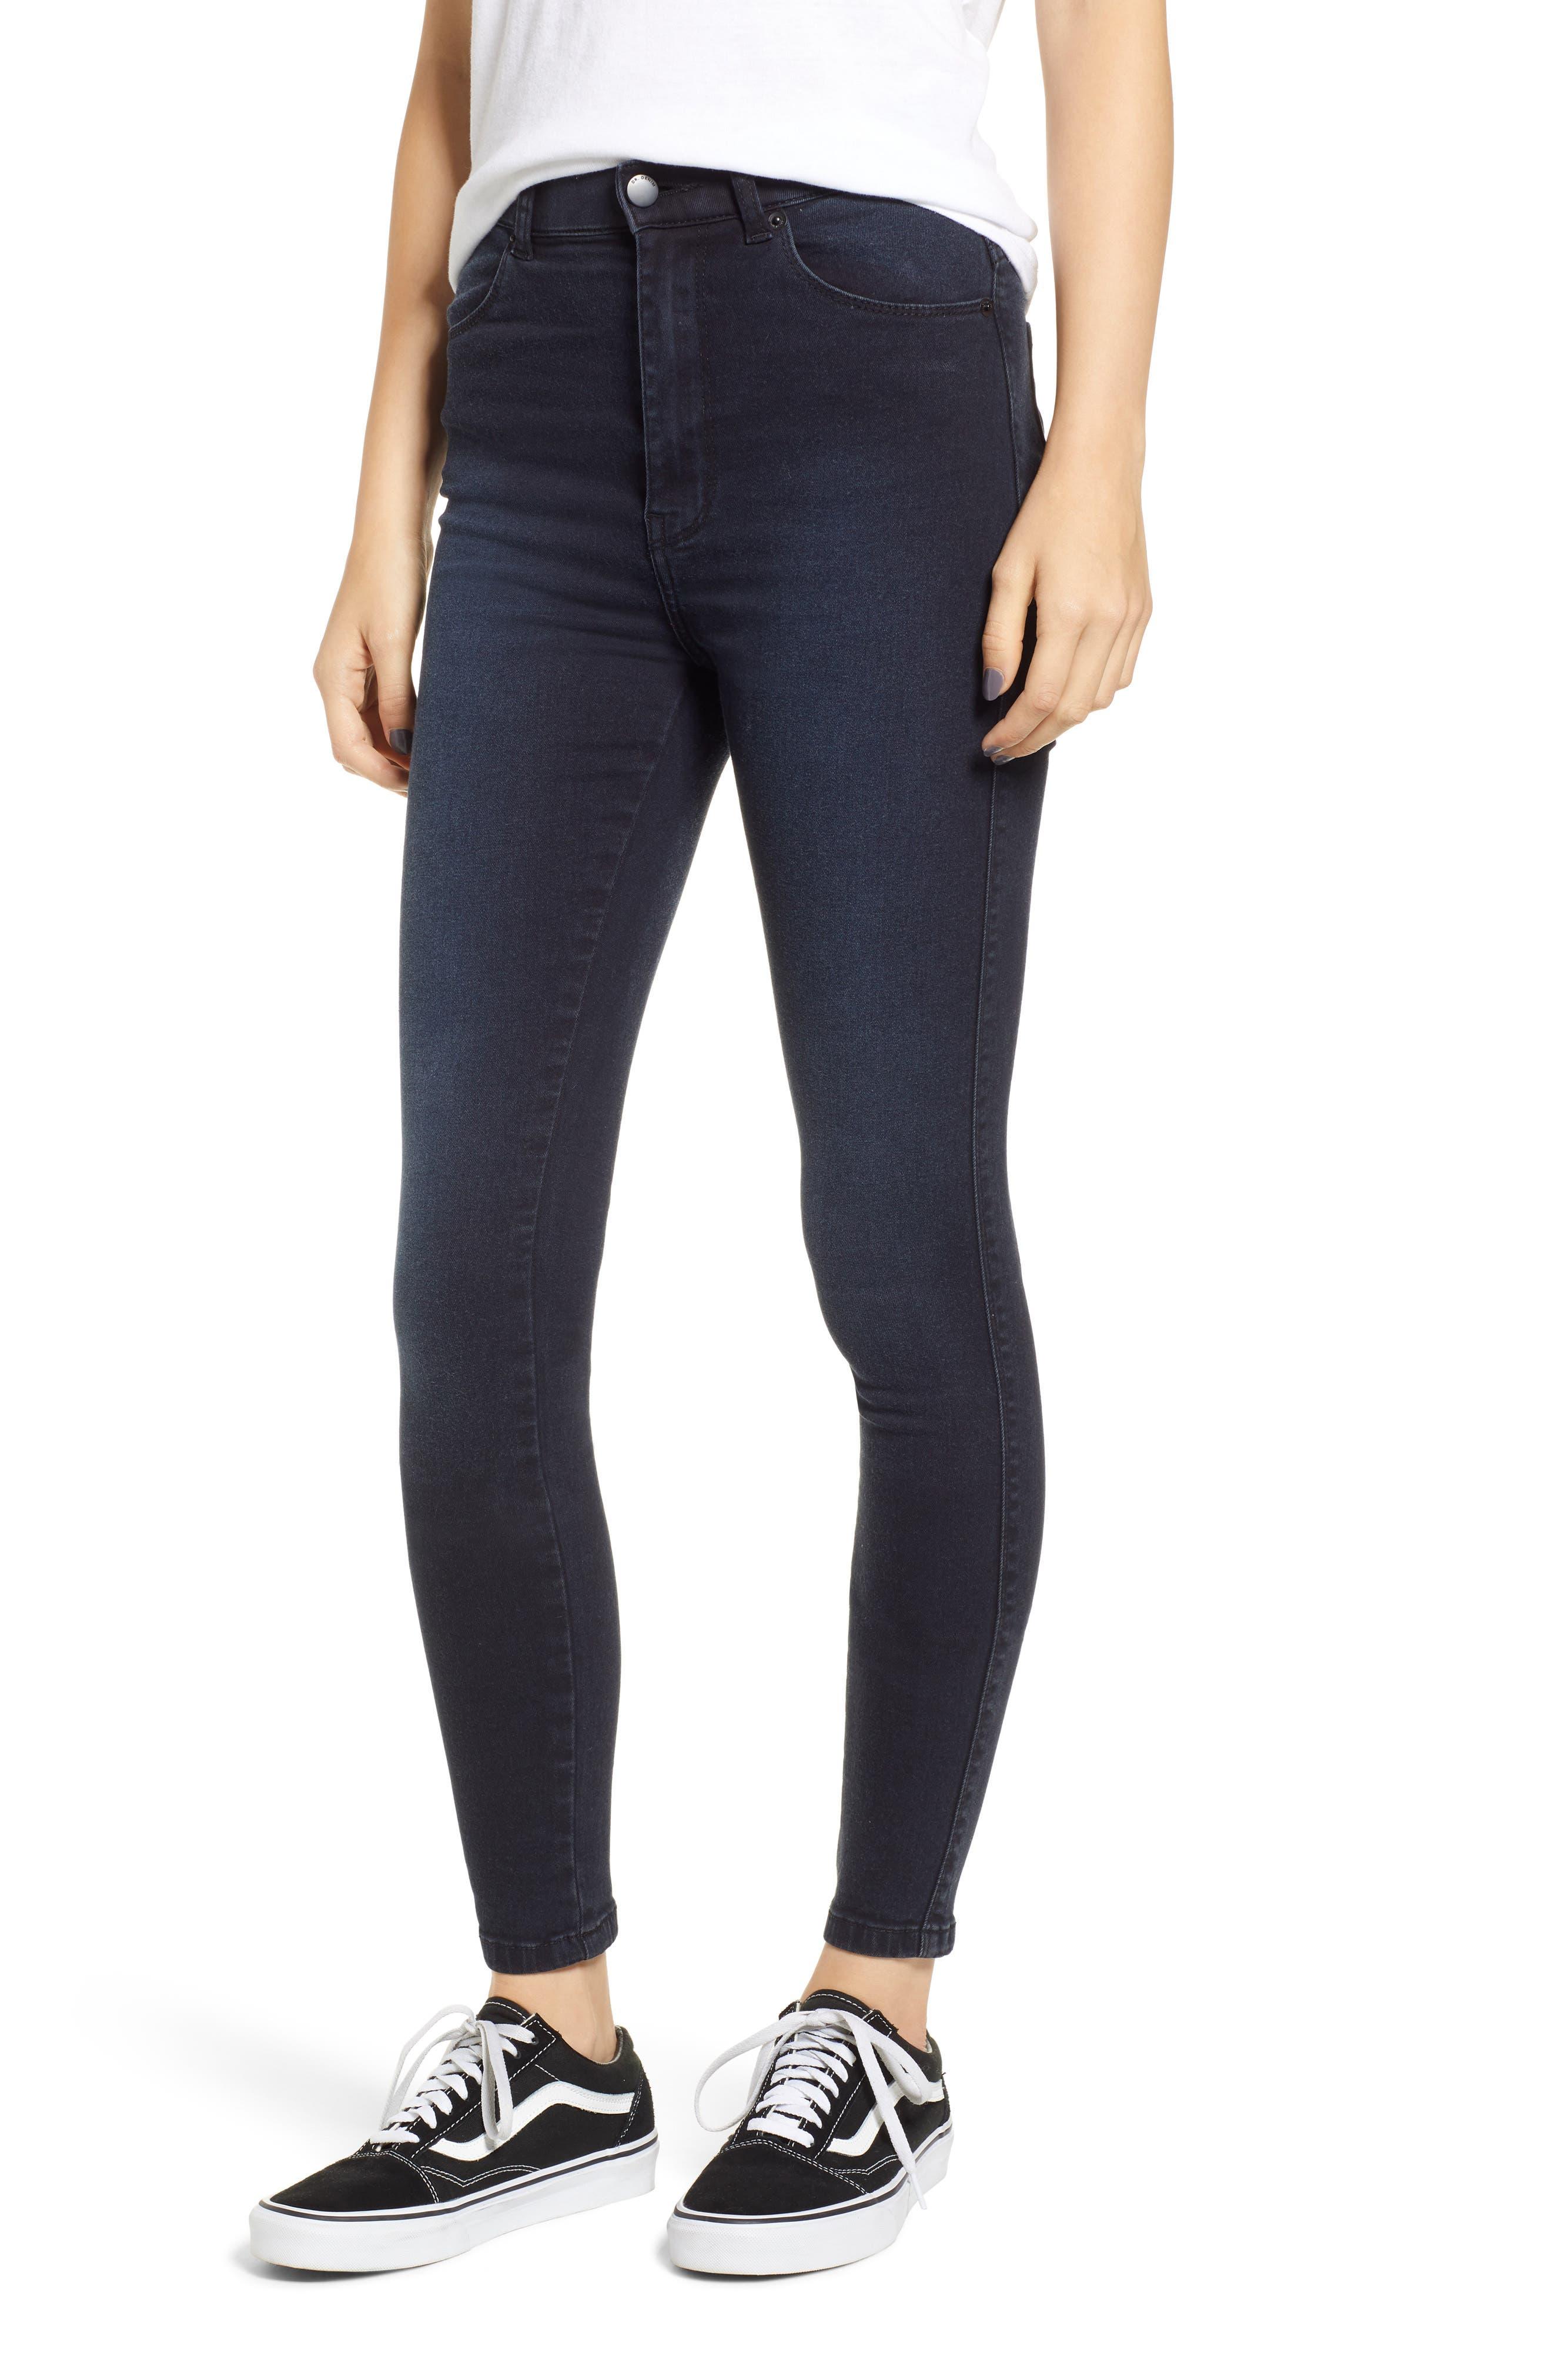 Moxy Skinny Jeans,                         Main,                         color, PITCH DARK BLUE